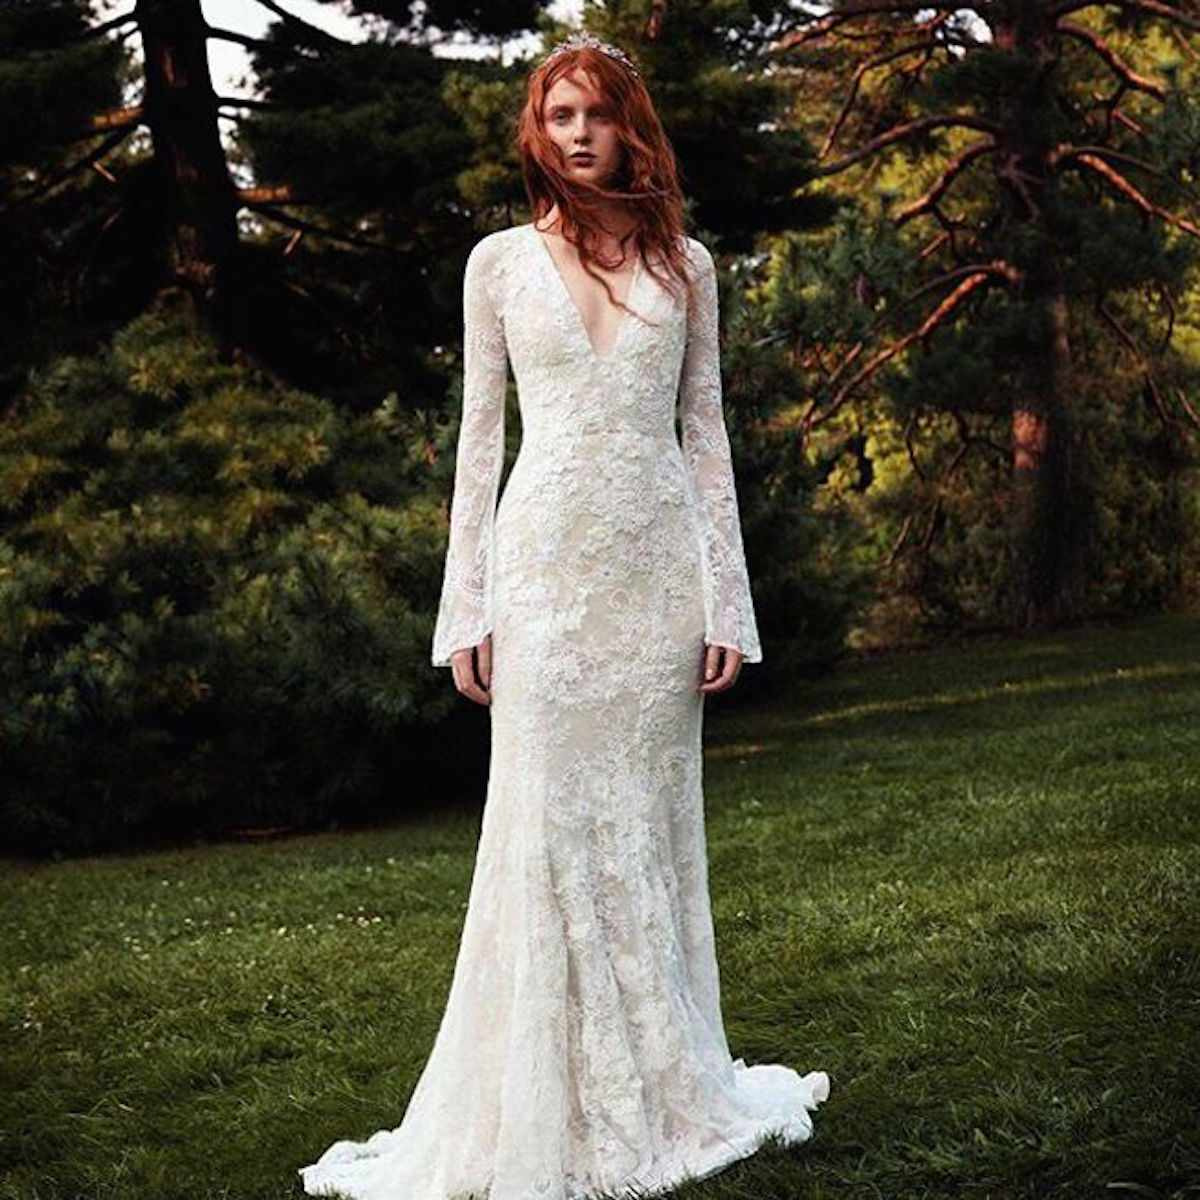 41 Vintage Inspired Wedding Dresses We Love